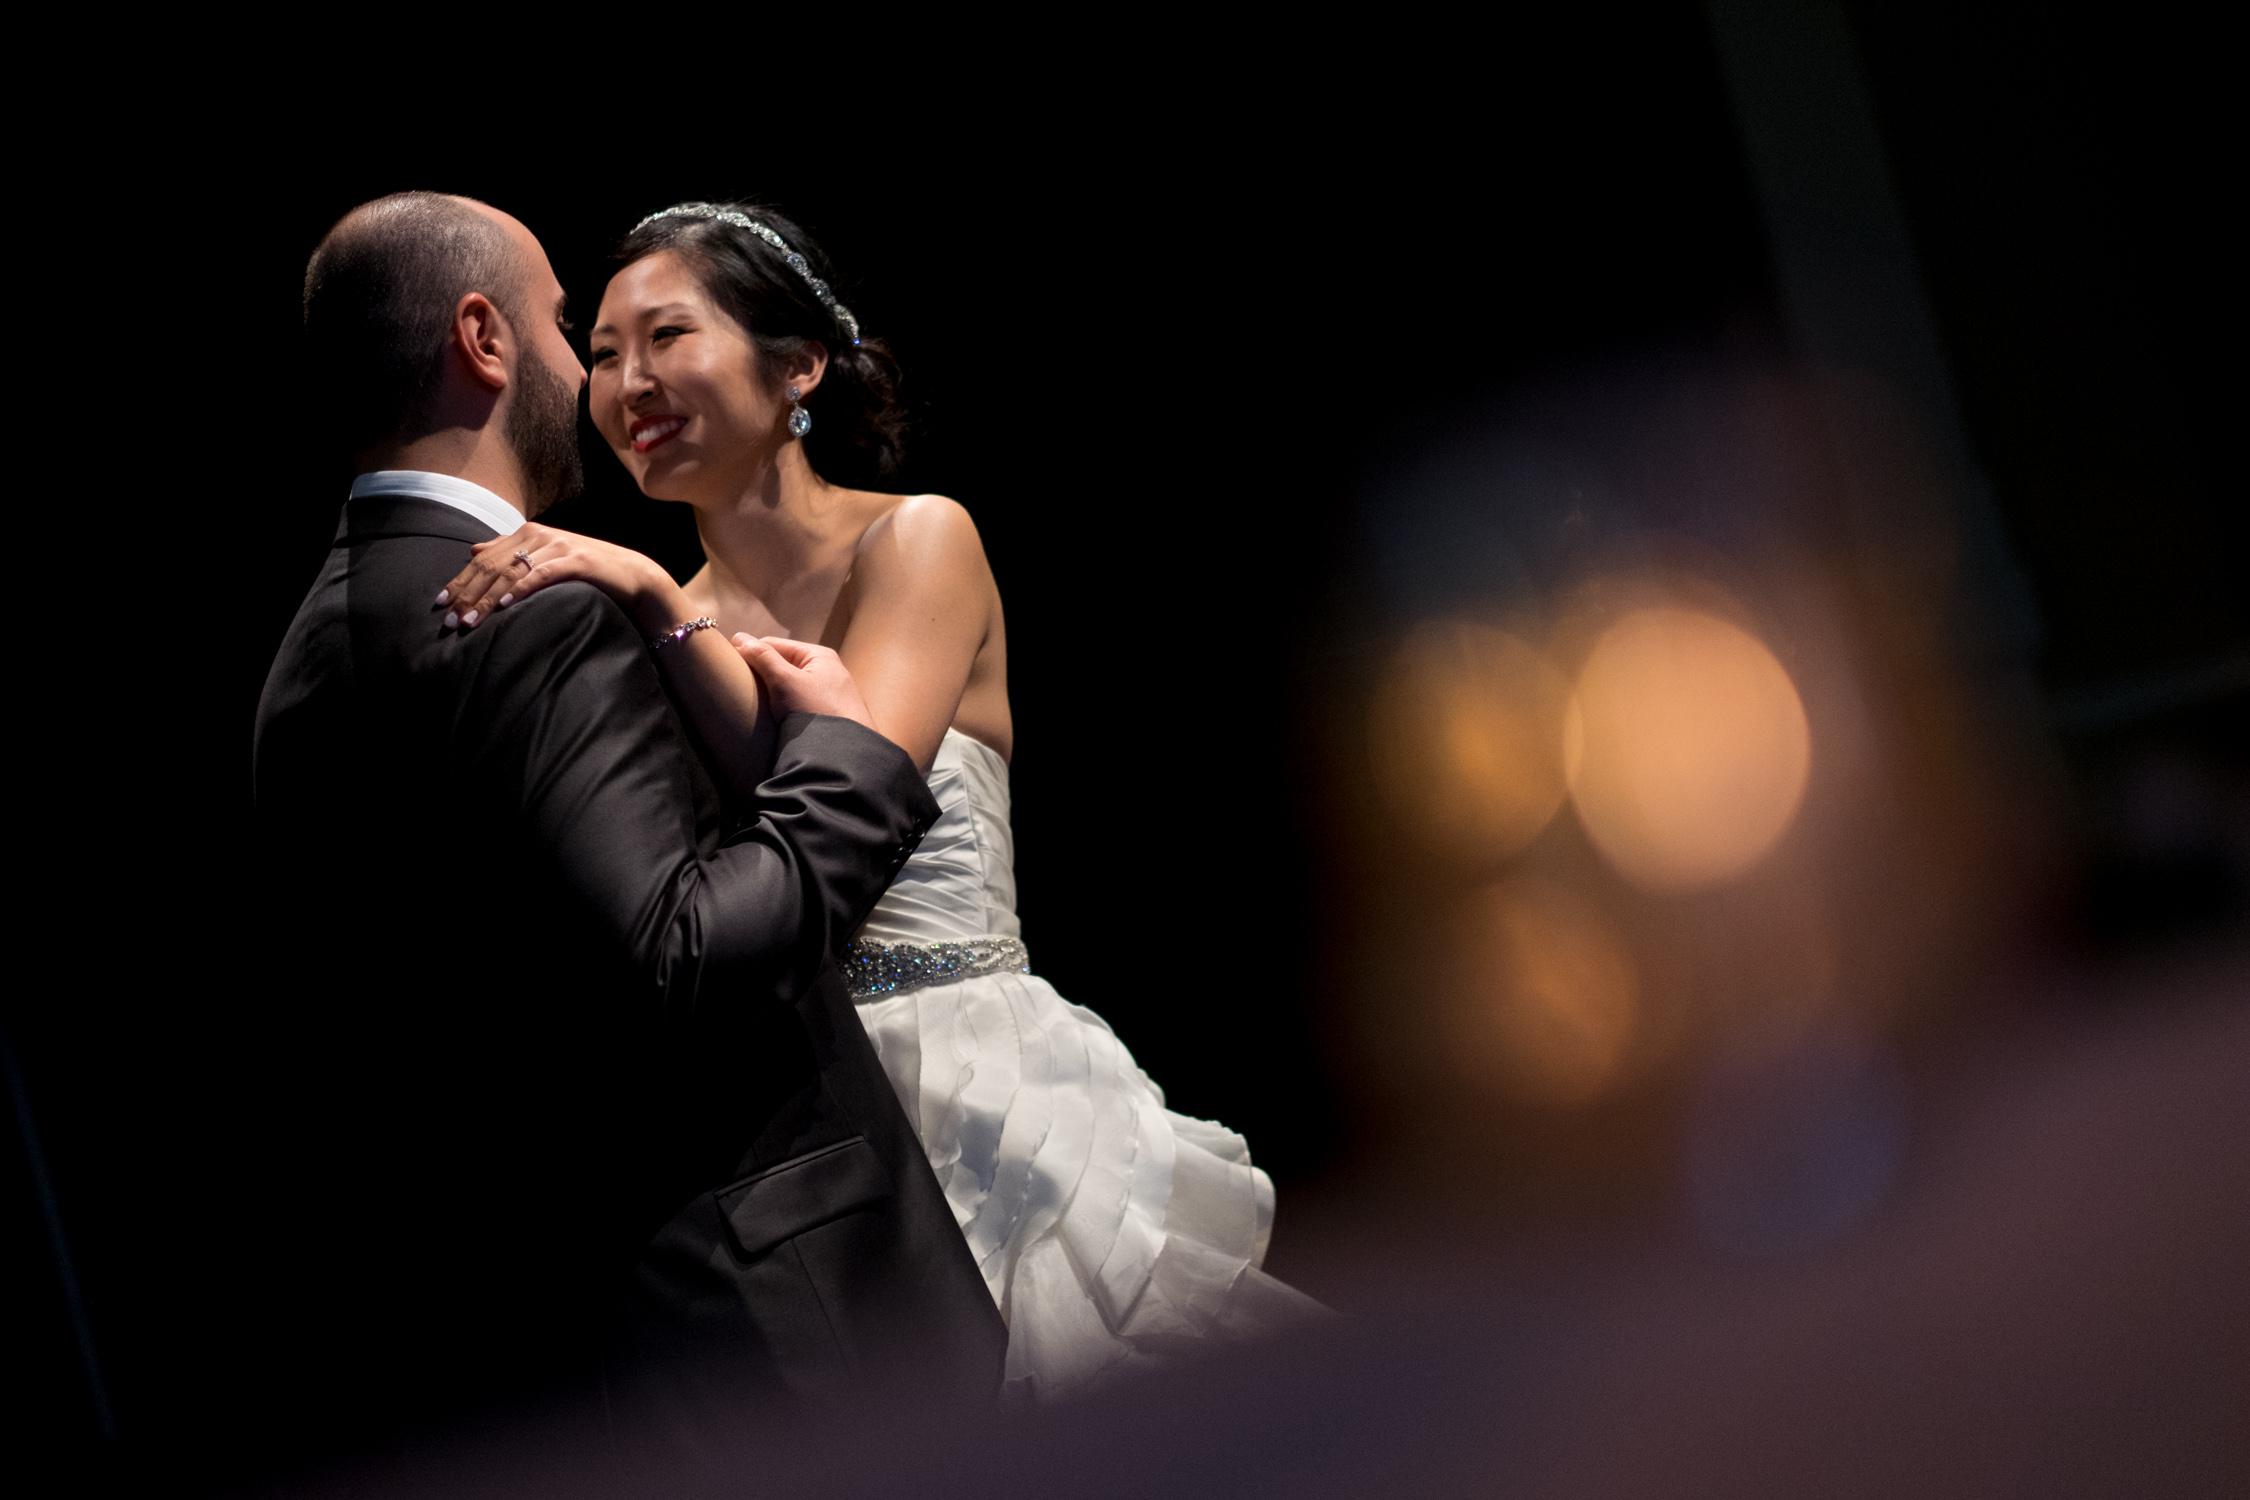 toronto_liberty_grand_wedding-012.jpg